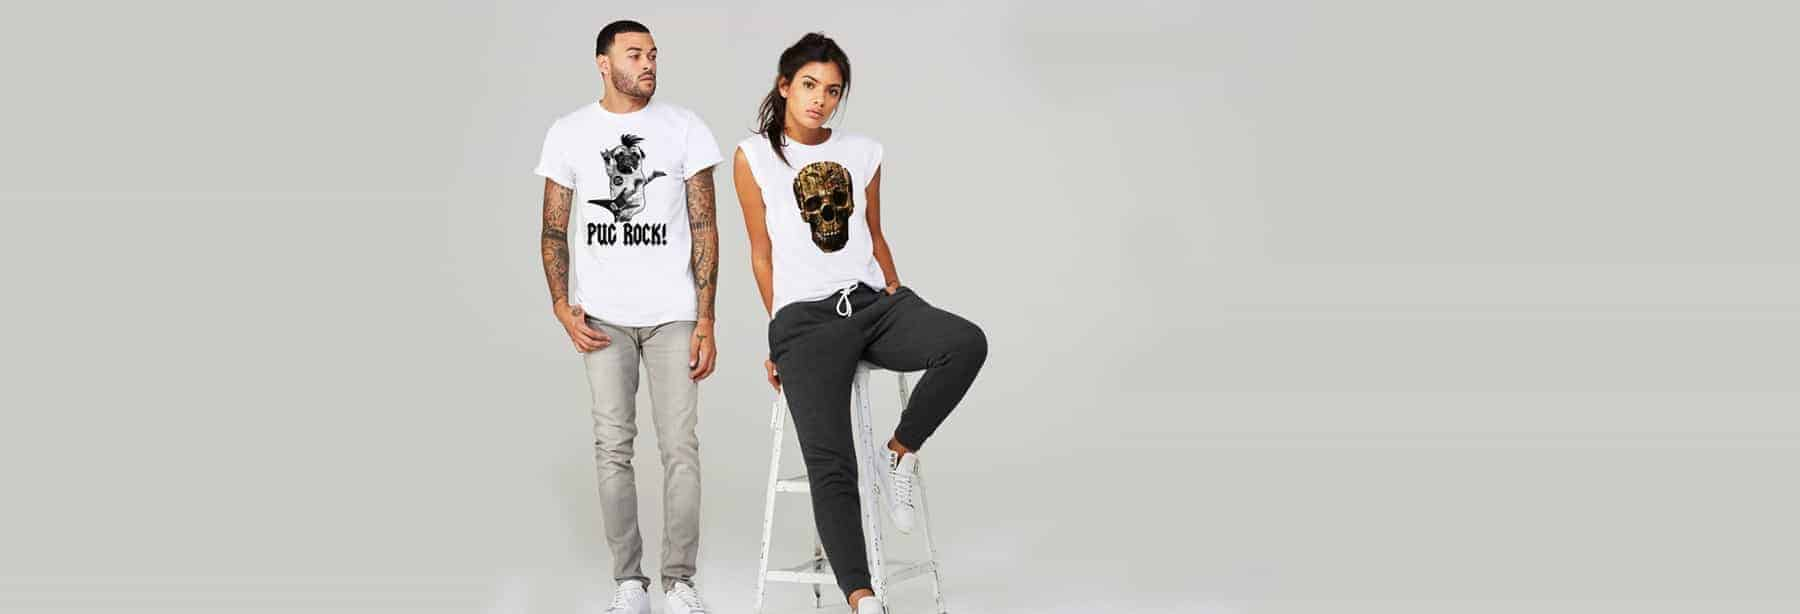 custom t shirts printing